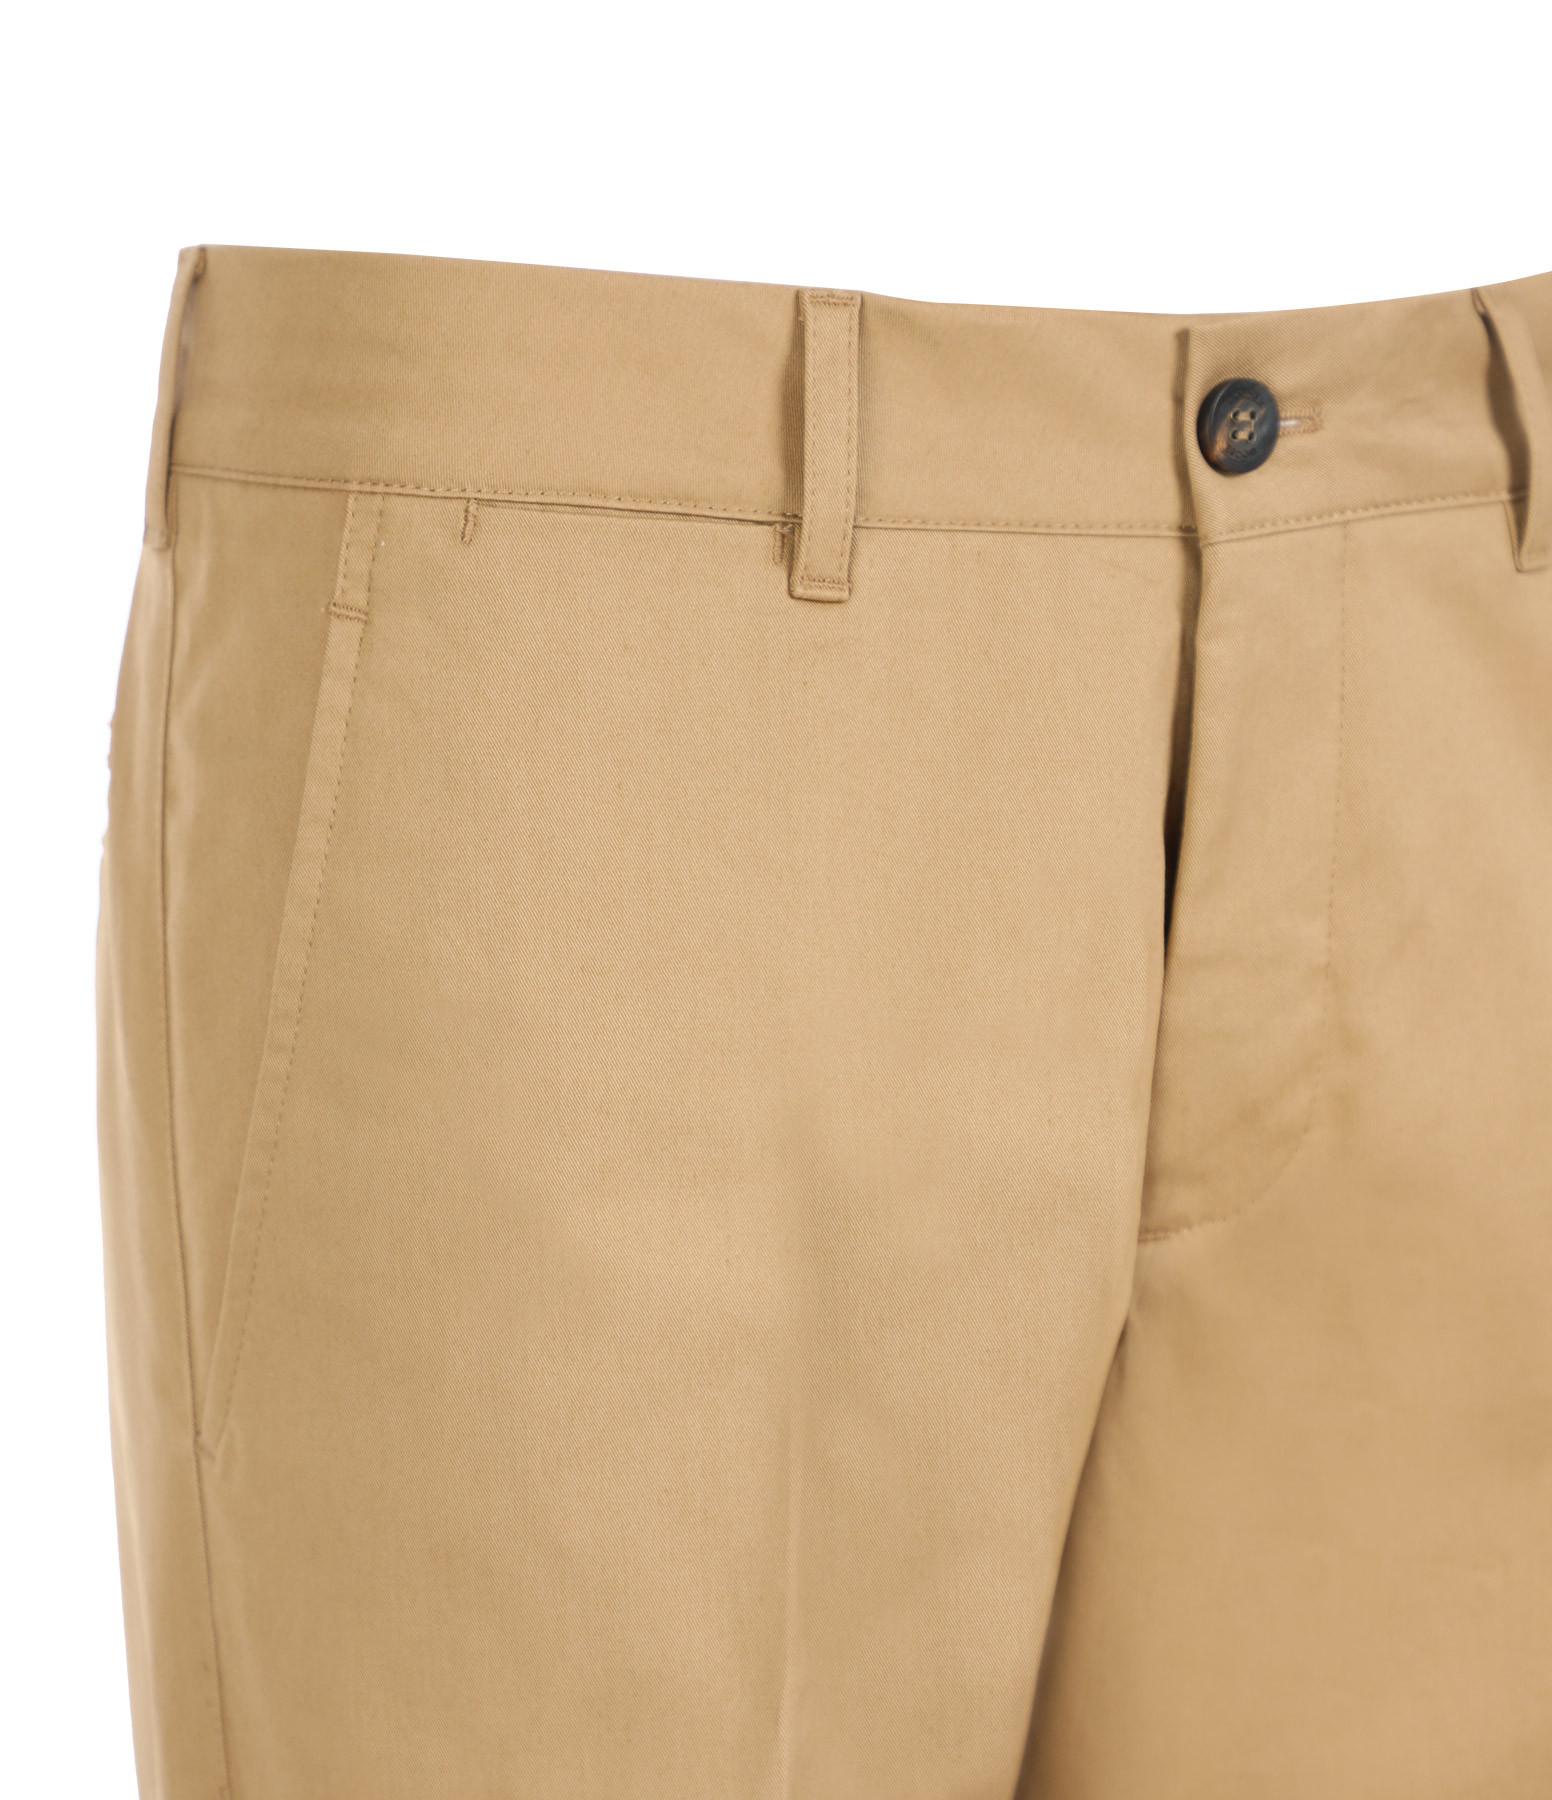 GOLDEN GOOSE - Pantalon Homme Chino Conrad Coton Beige